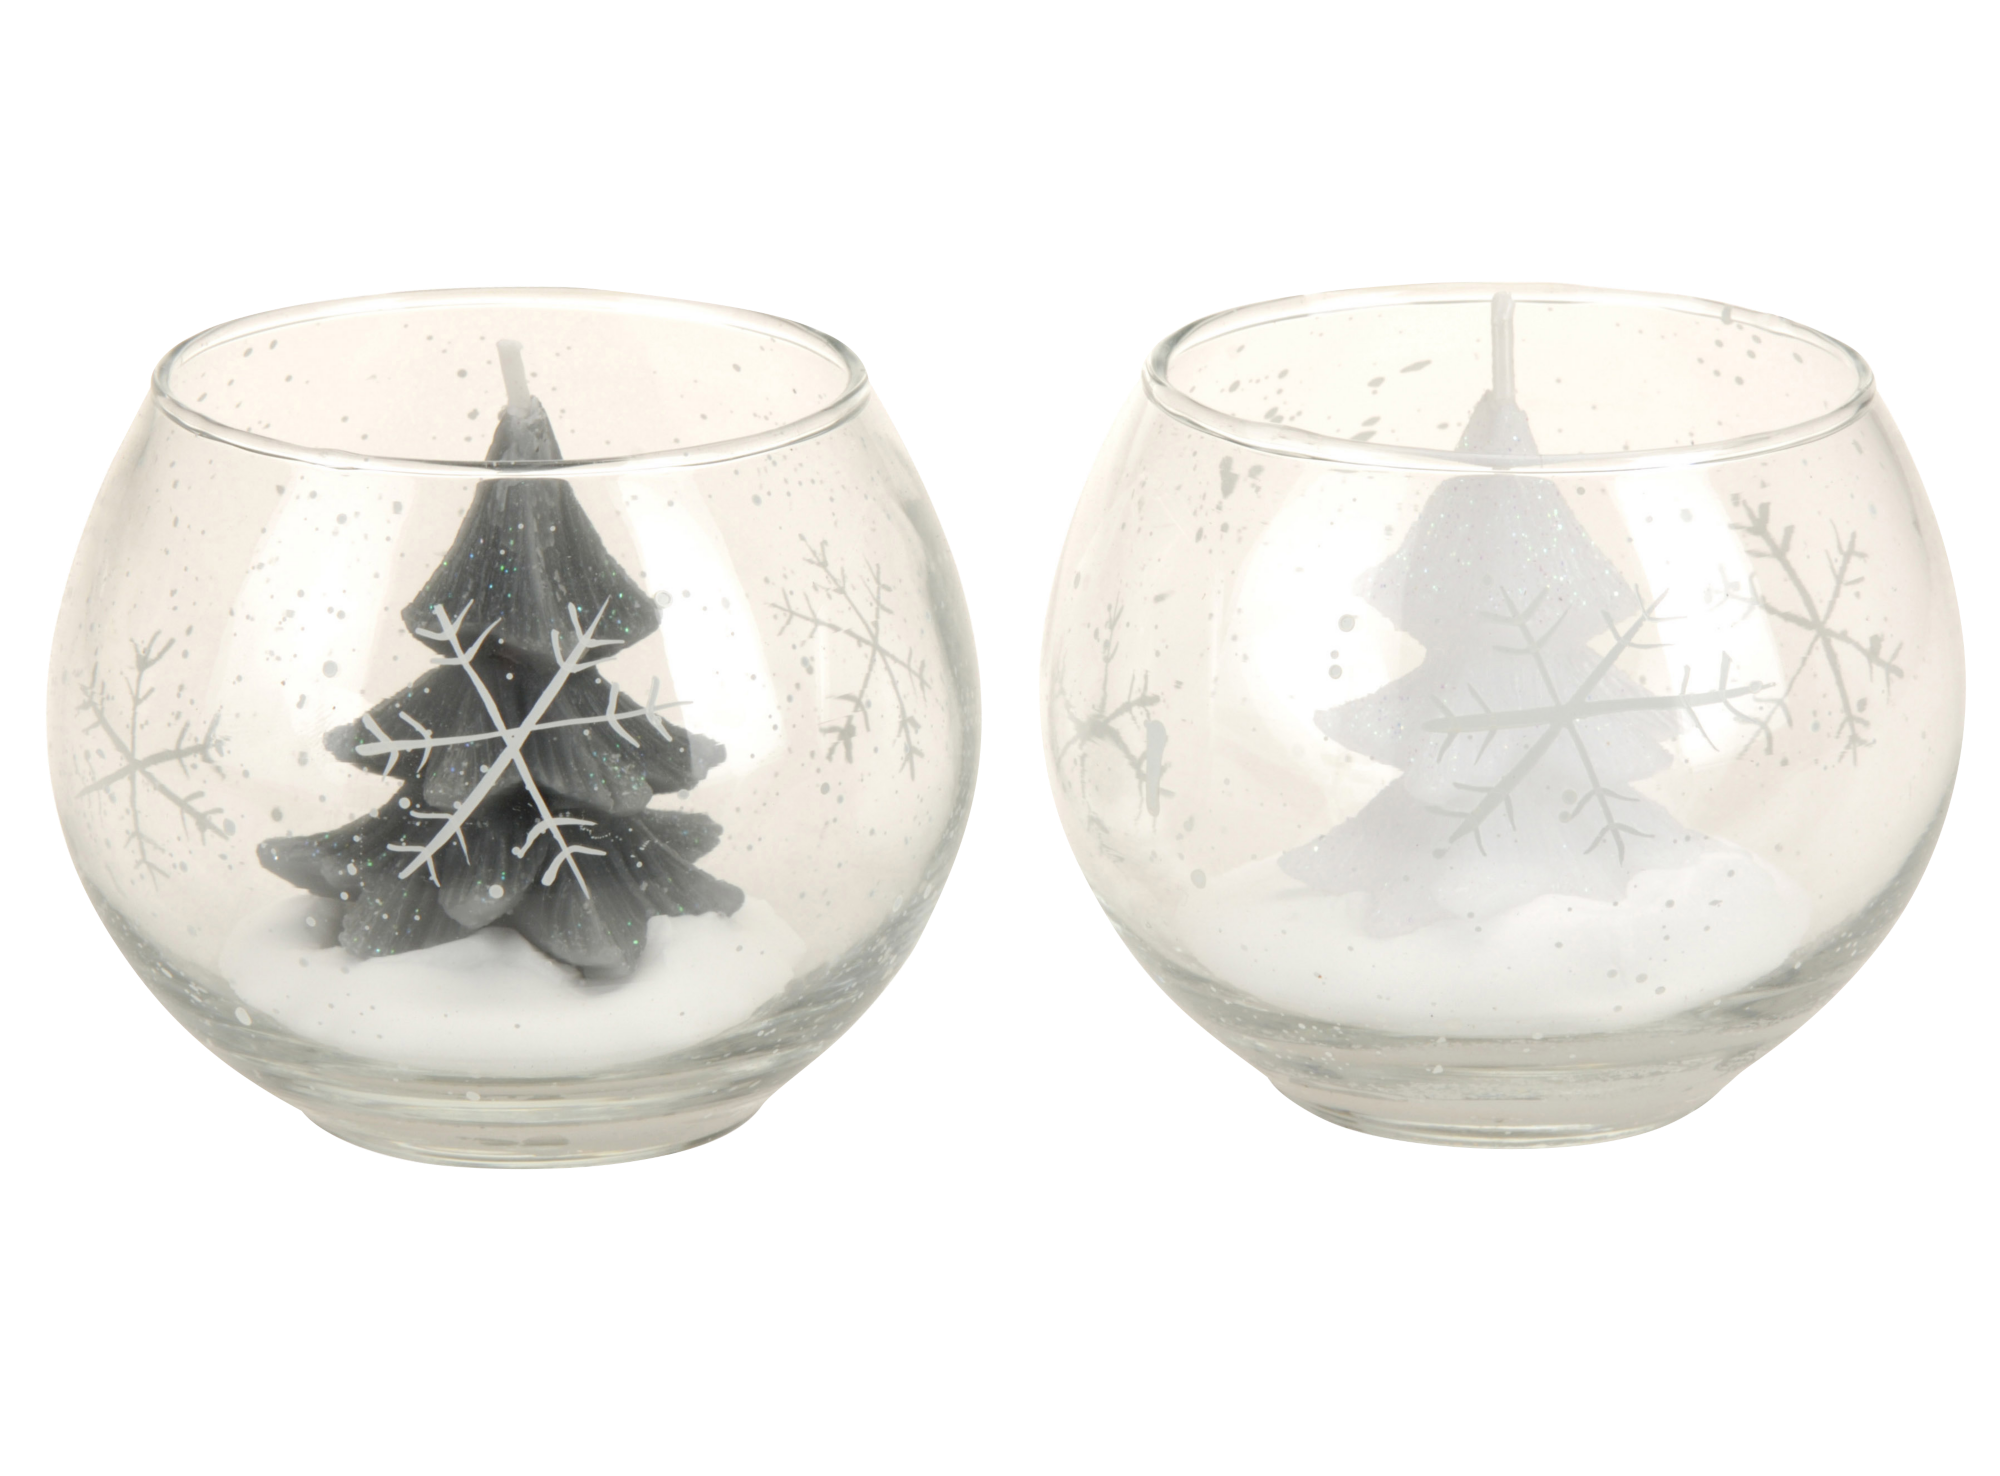 Bougie en paraffine en forme de sapin dans verre en verre h8cm - 2 co ...